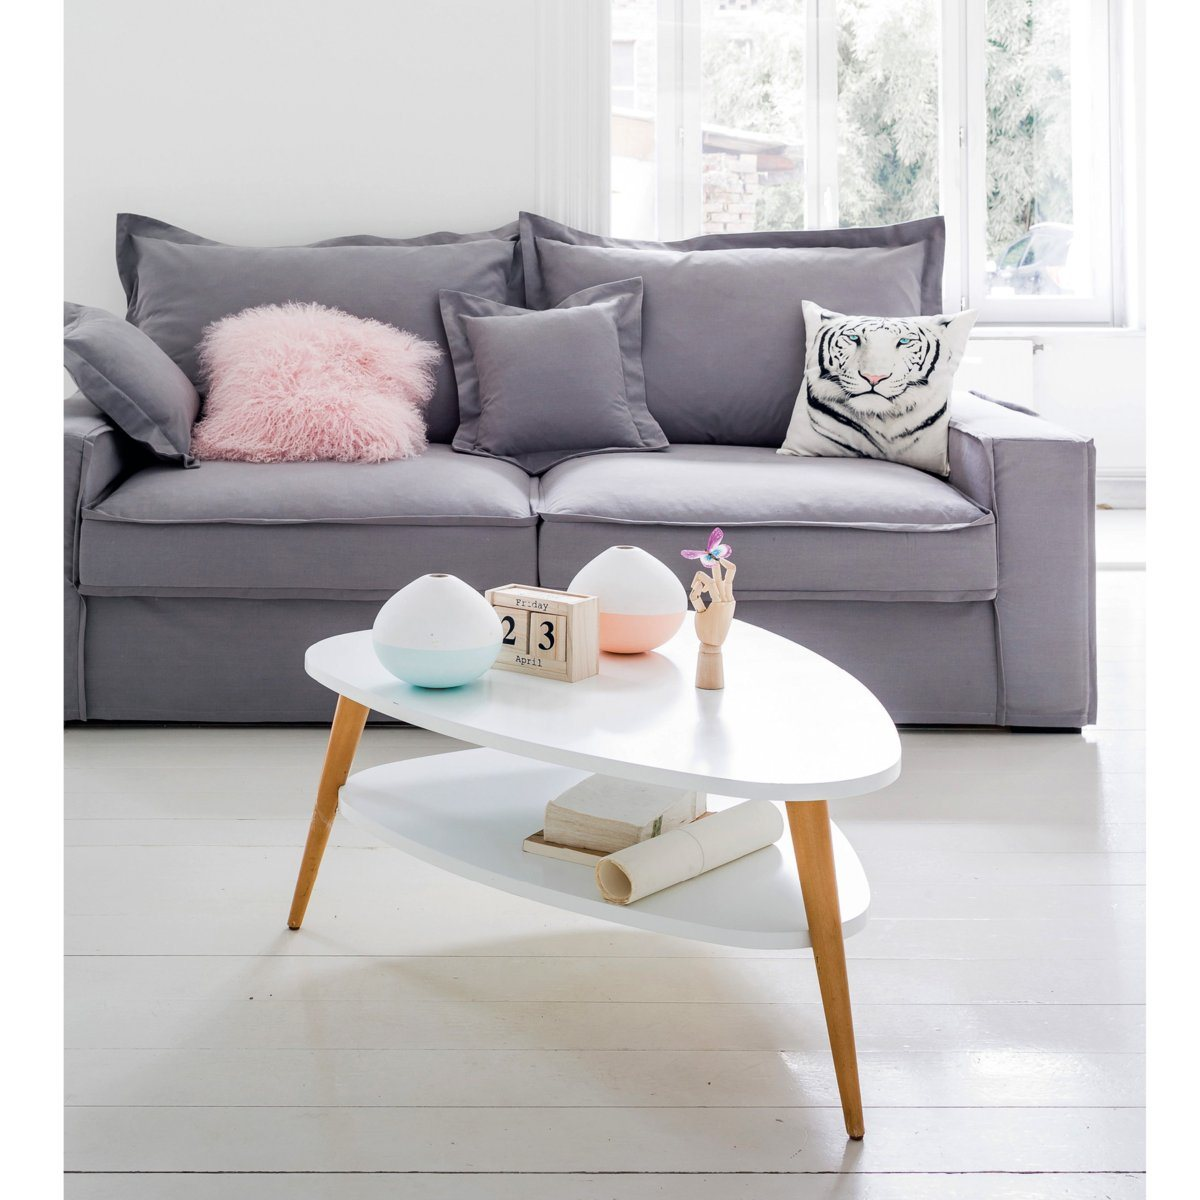 Canapé lit couchage express Hubot La Redoute Interieurs - Iziva.com